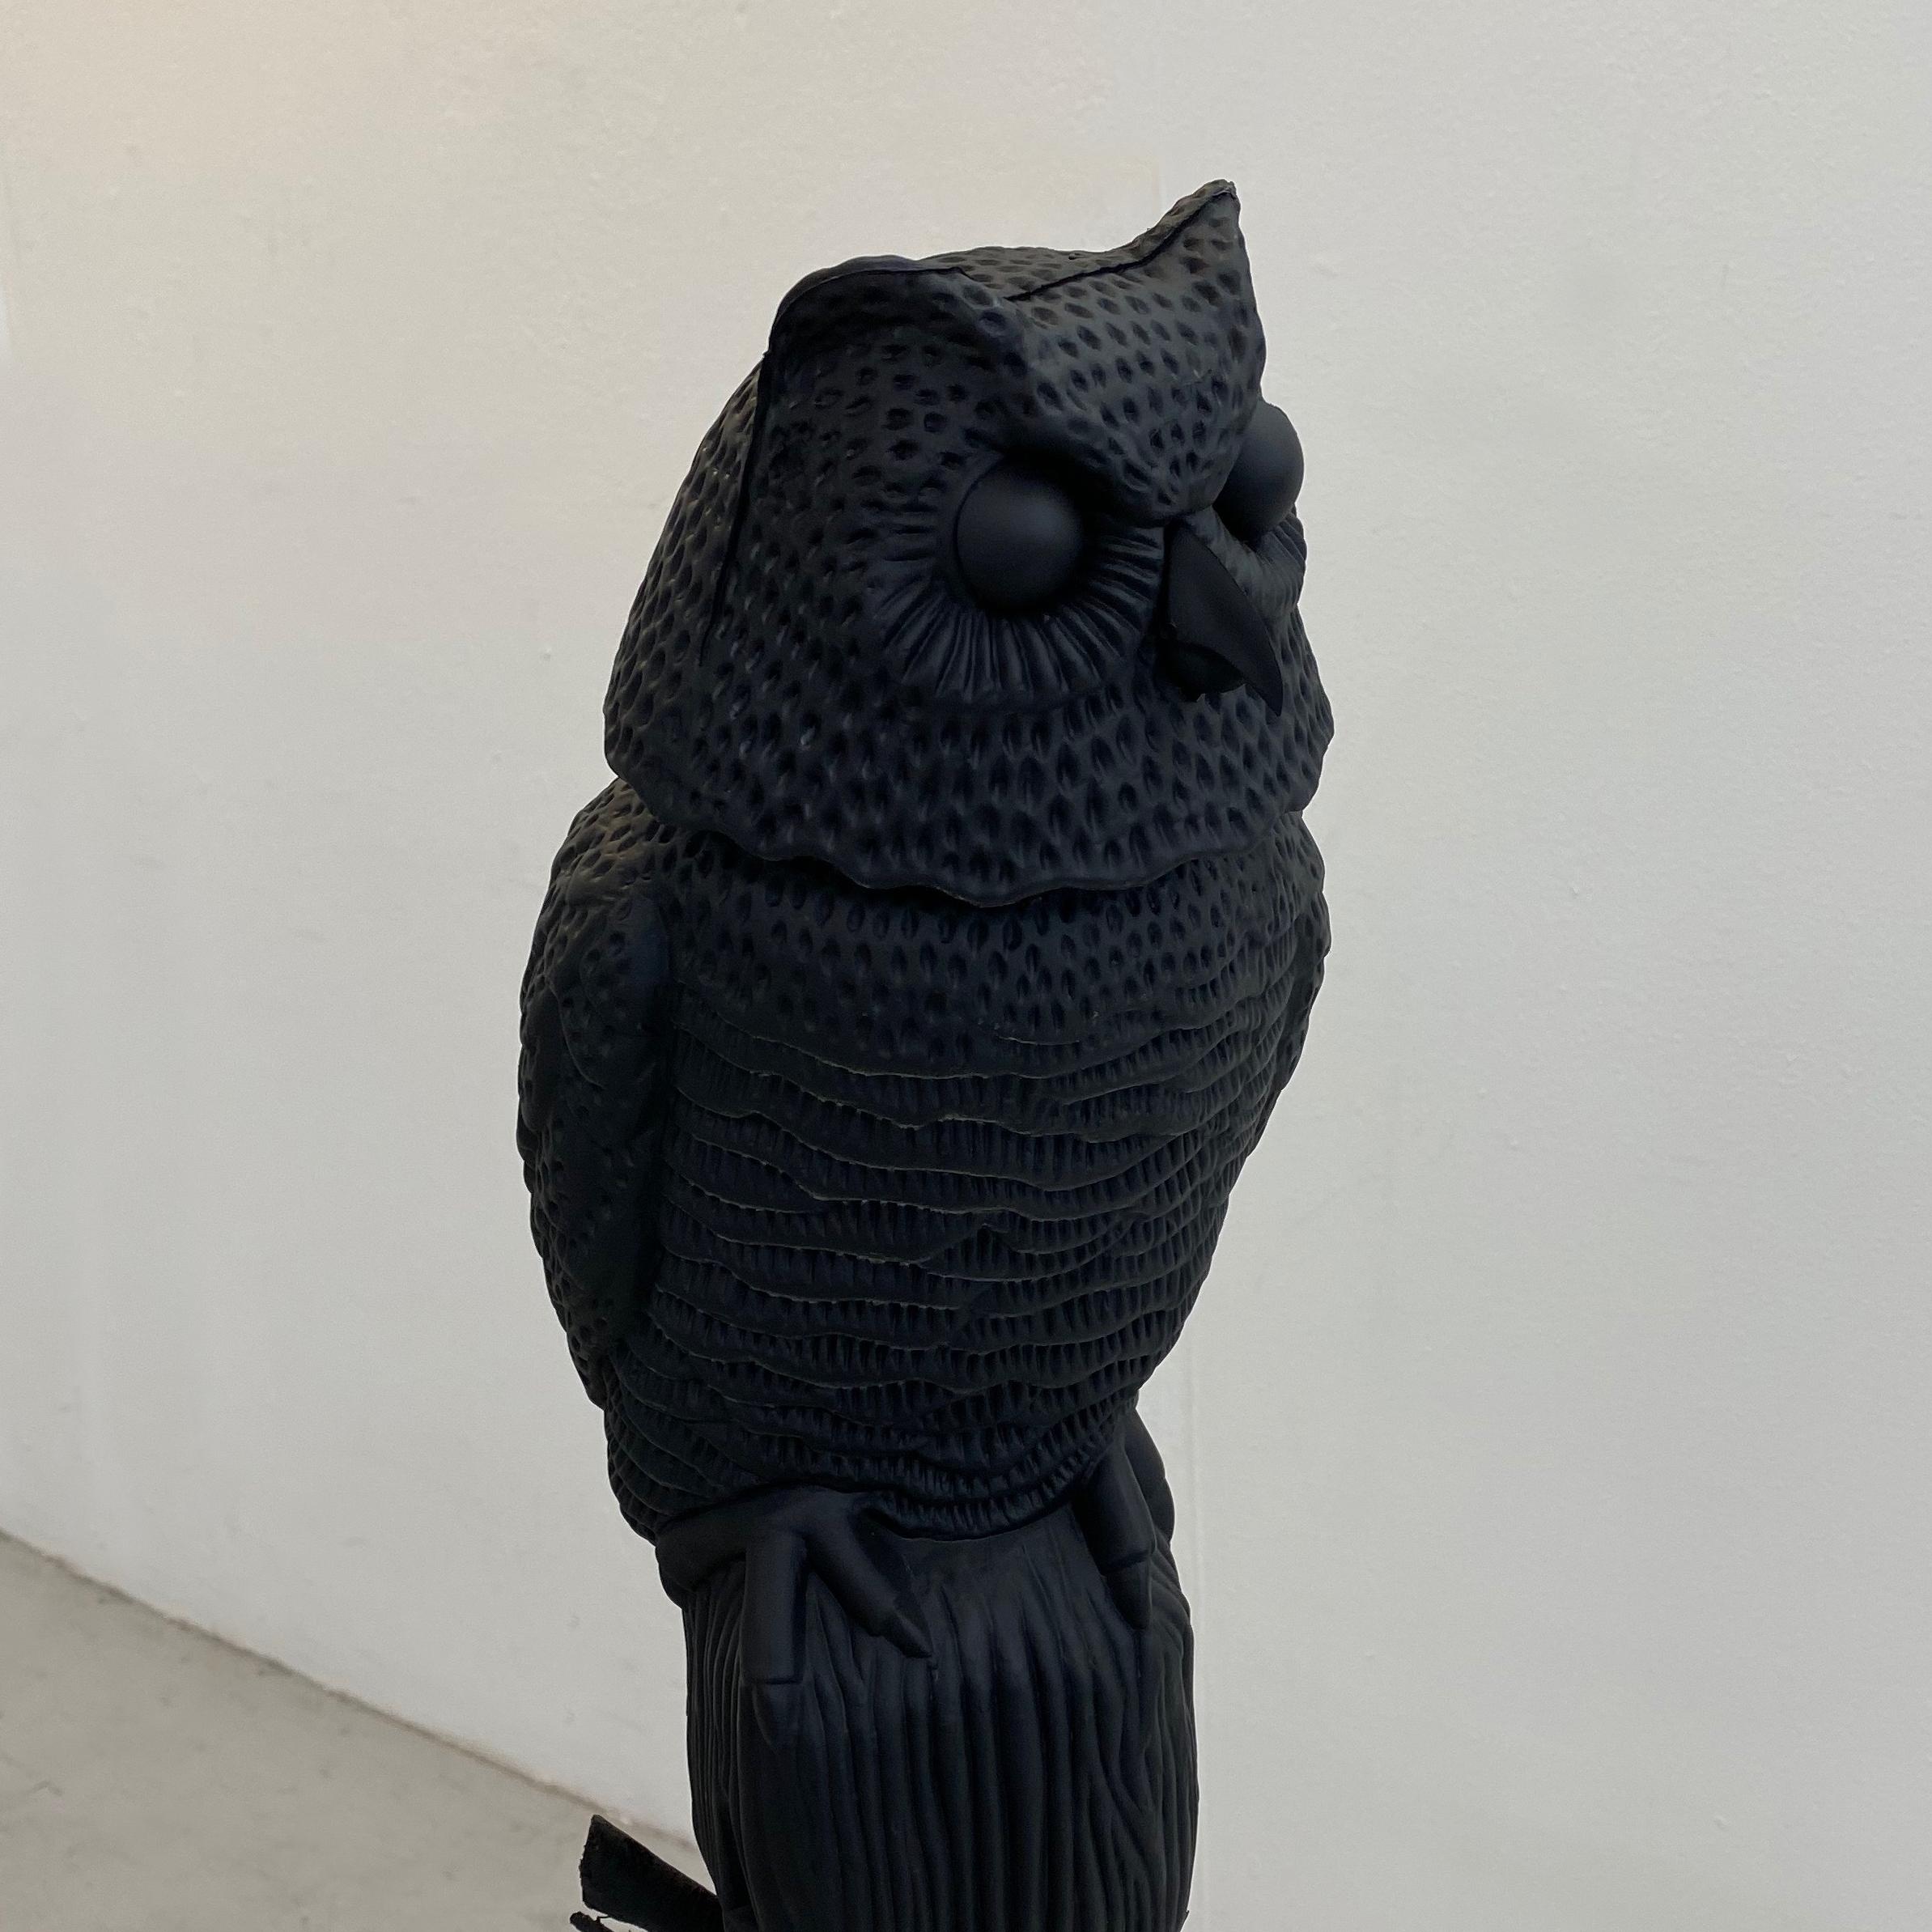 Night Crawlers. 2019. Found objects. Matt Paint.